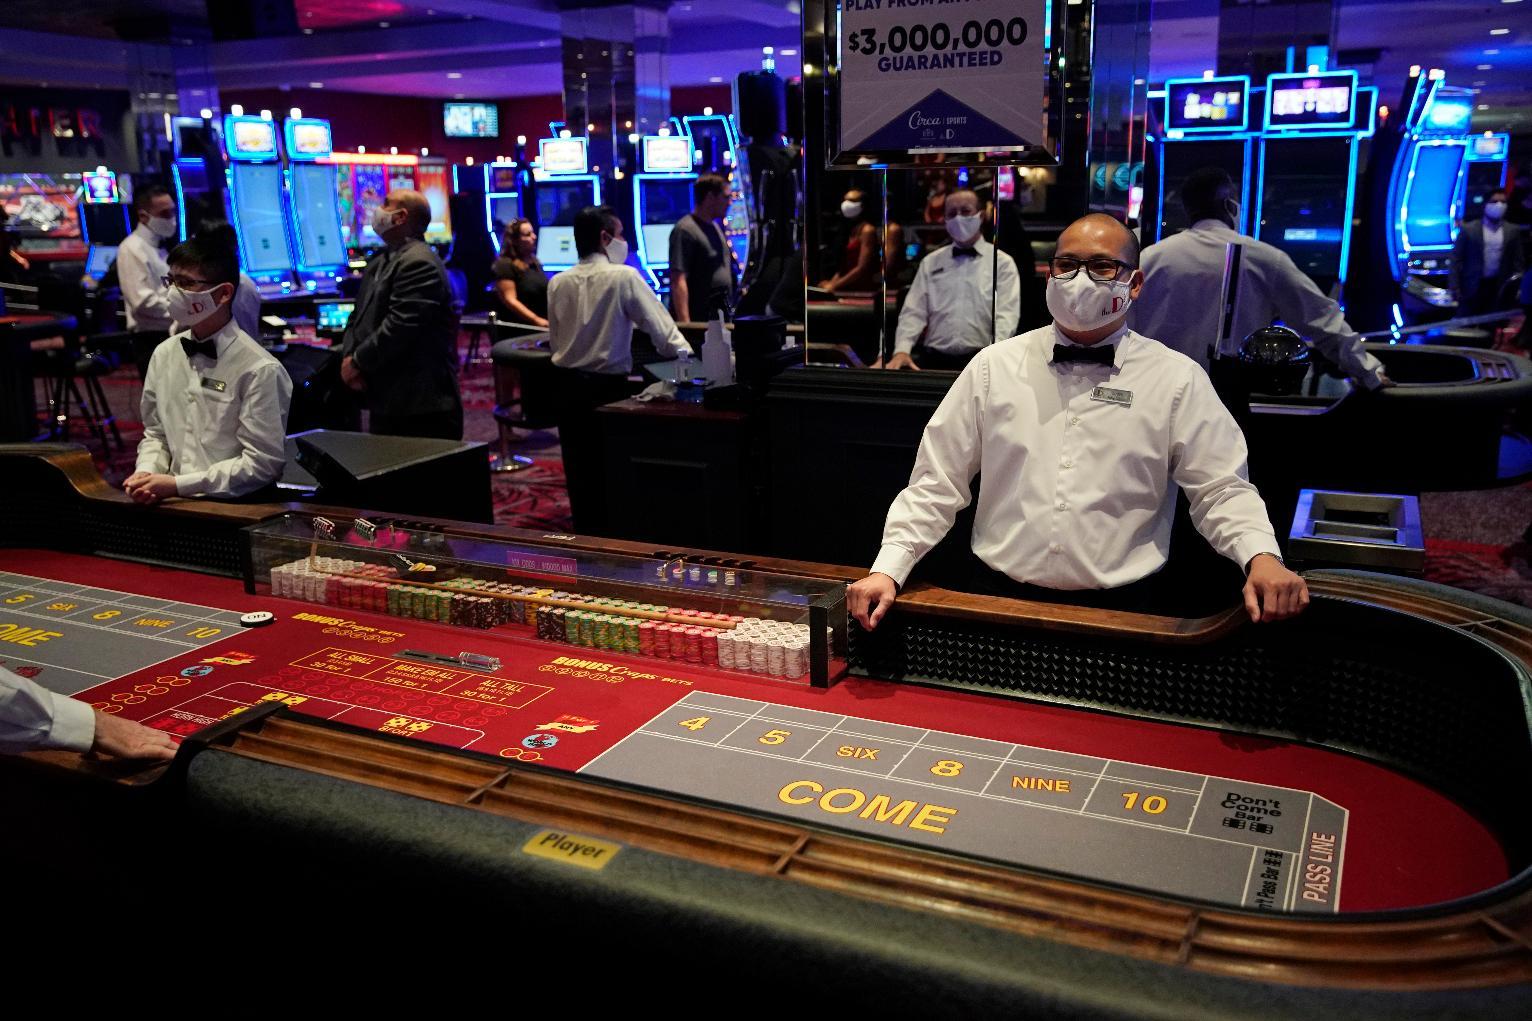 The history of gambling. 46